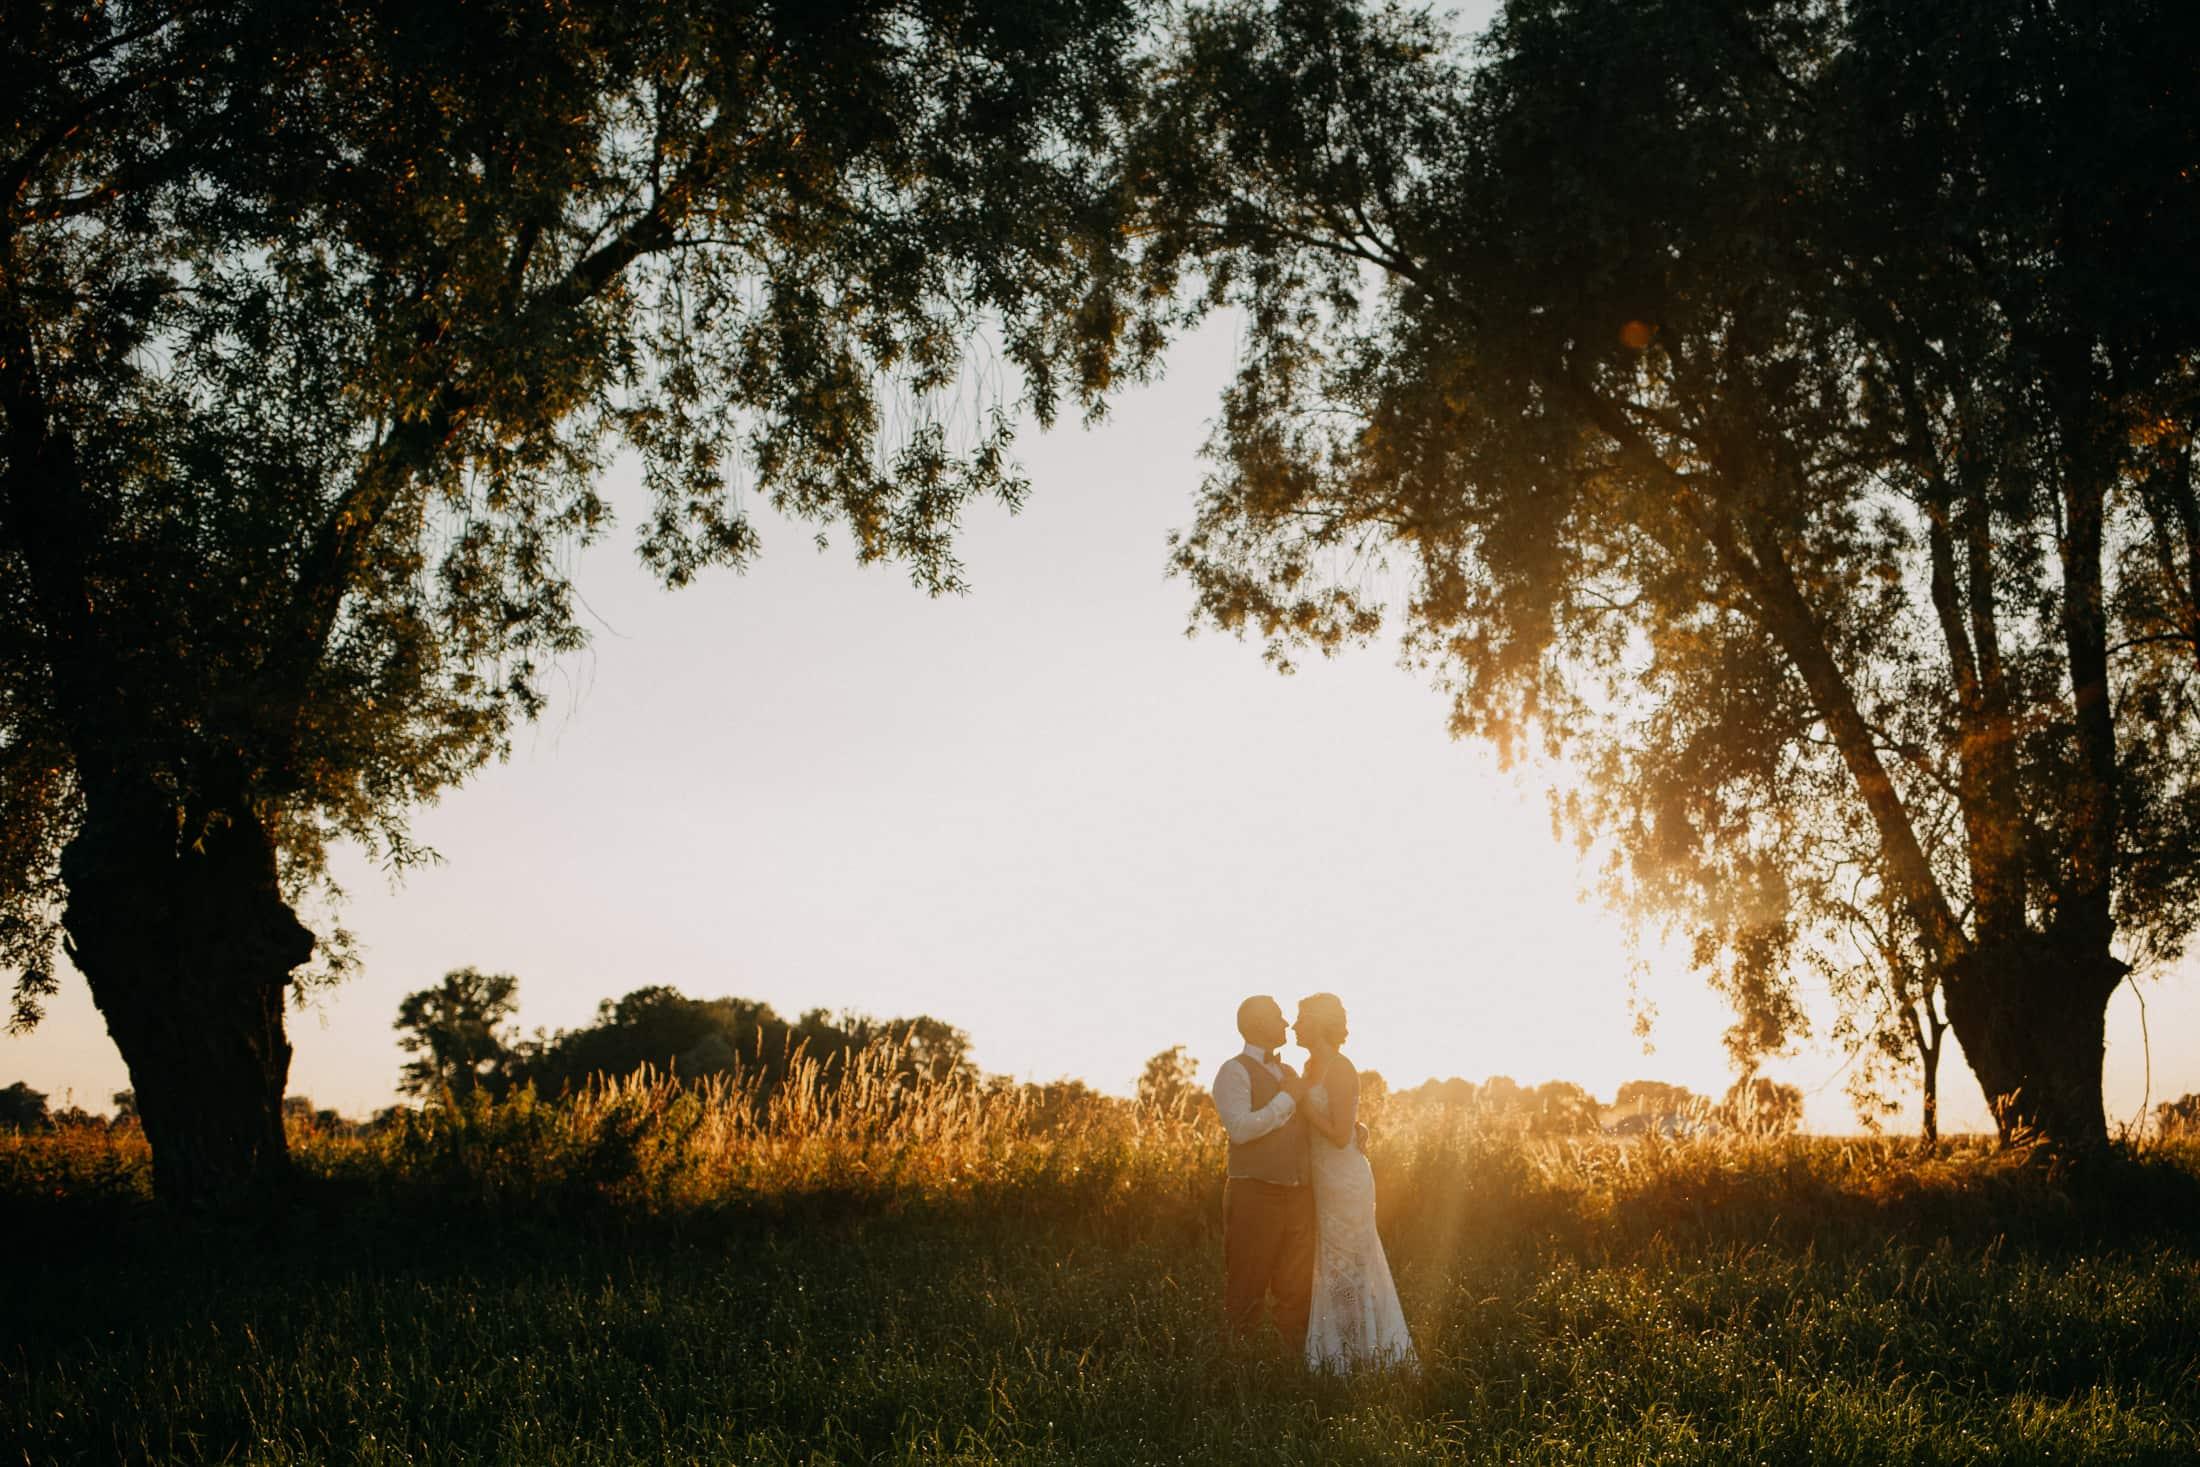 fotograf na ślub płońsk